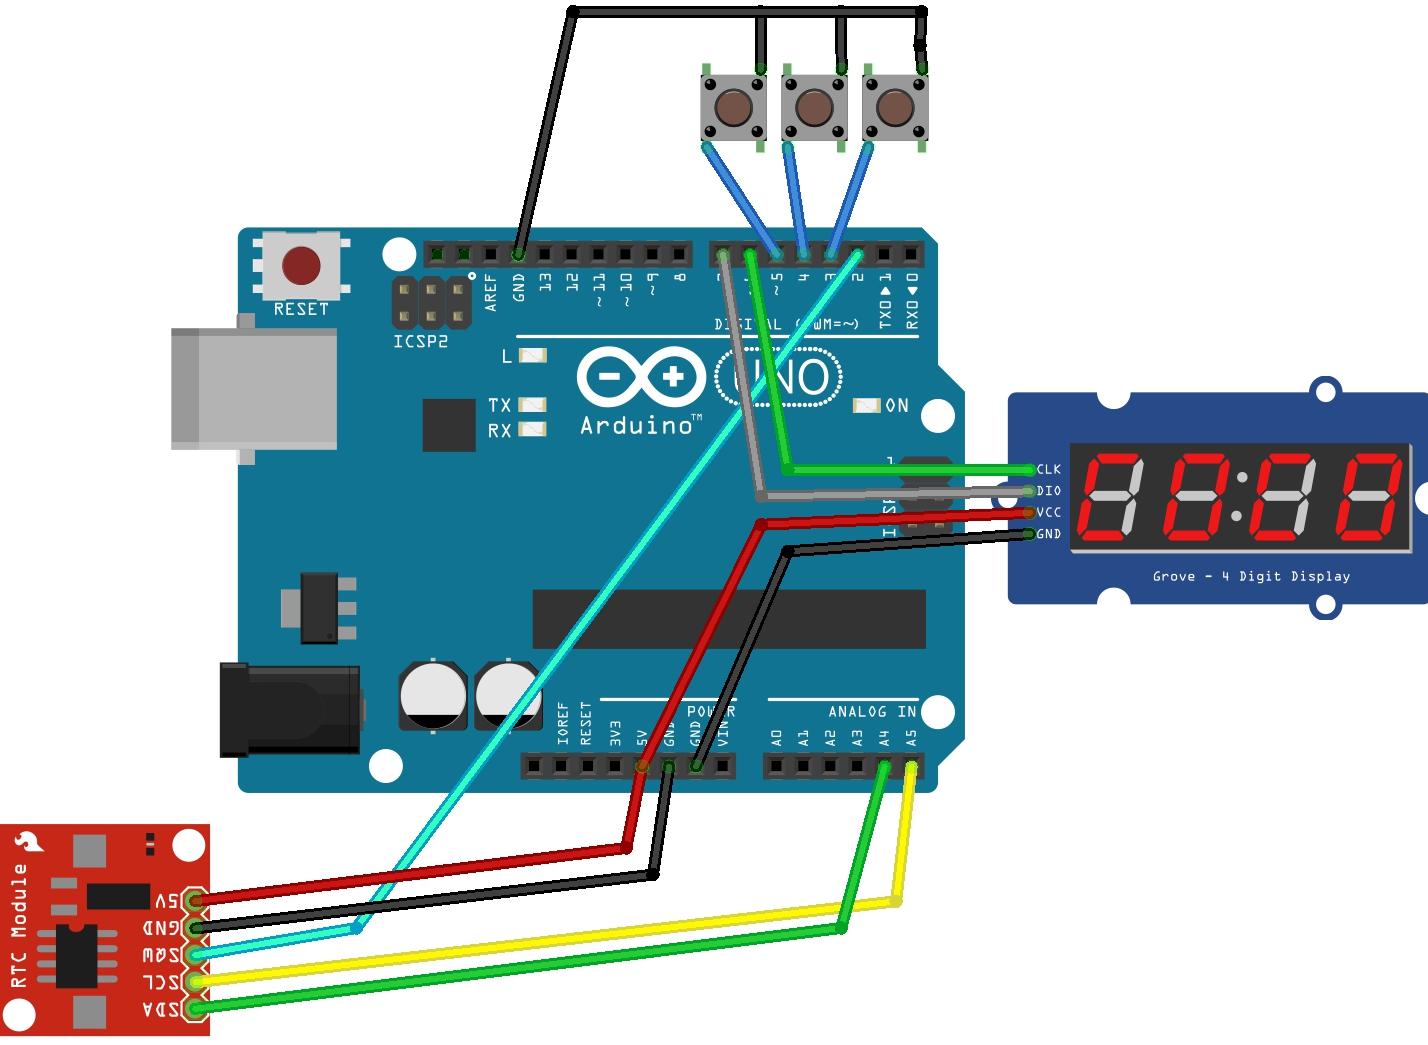 making a digital clock arduino 7 segment 4 digit tm1637 rh pinterest com